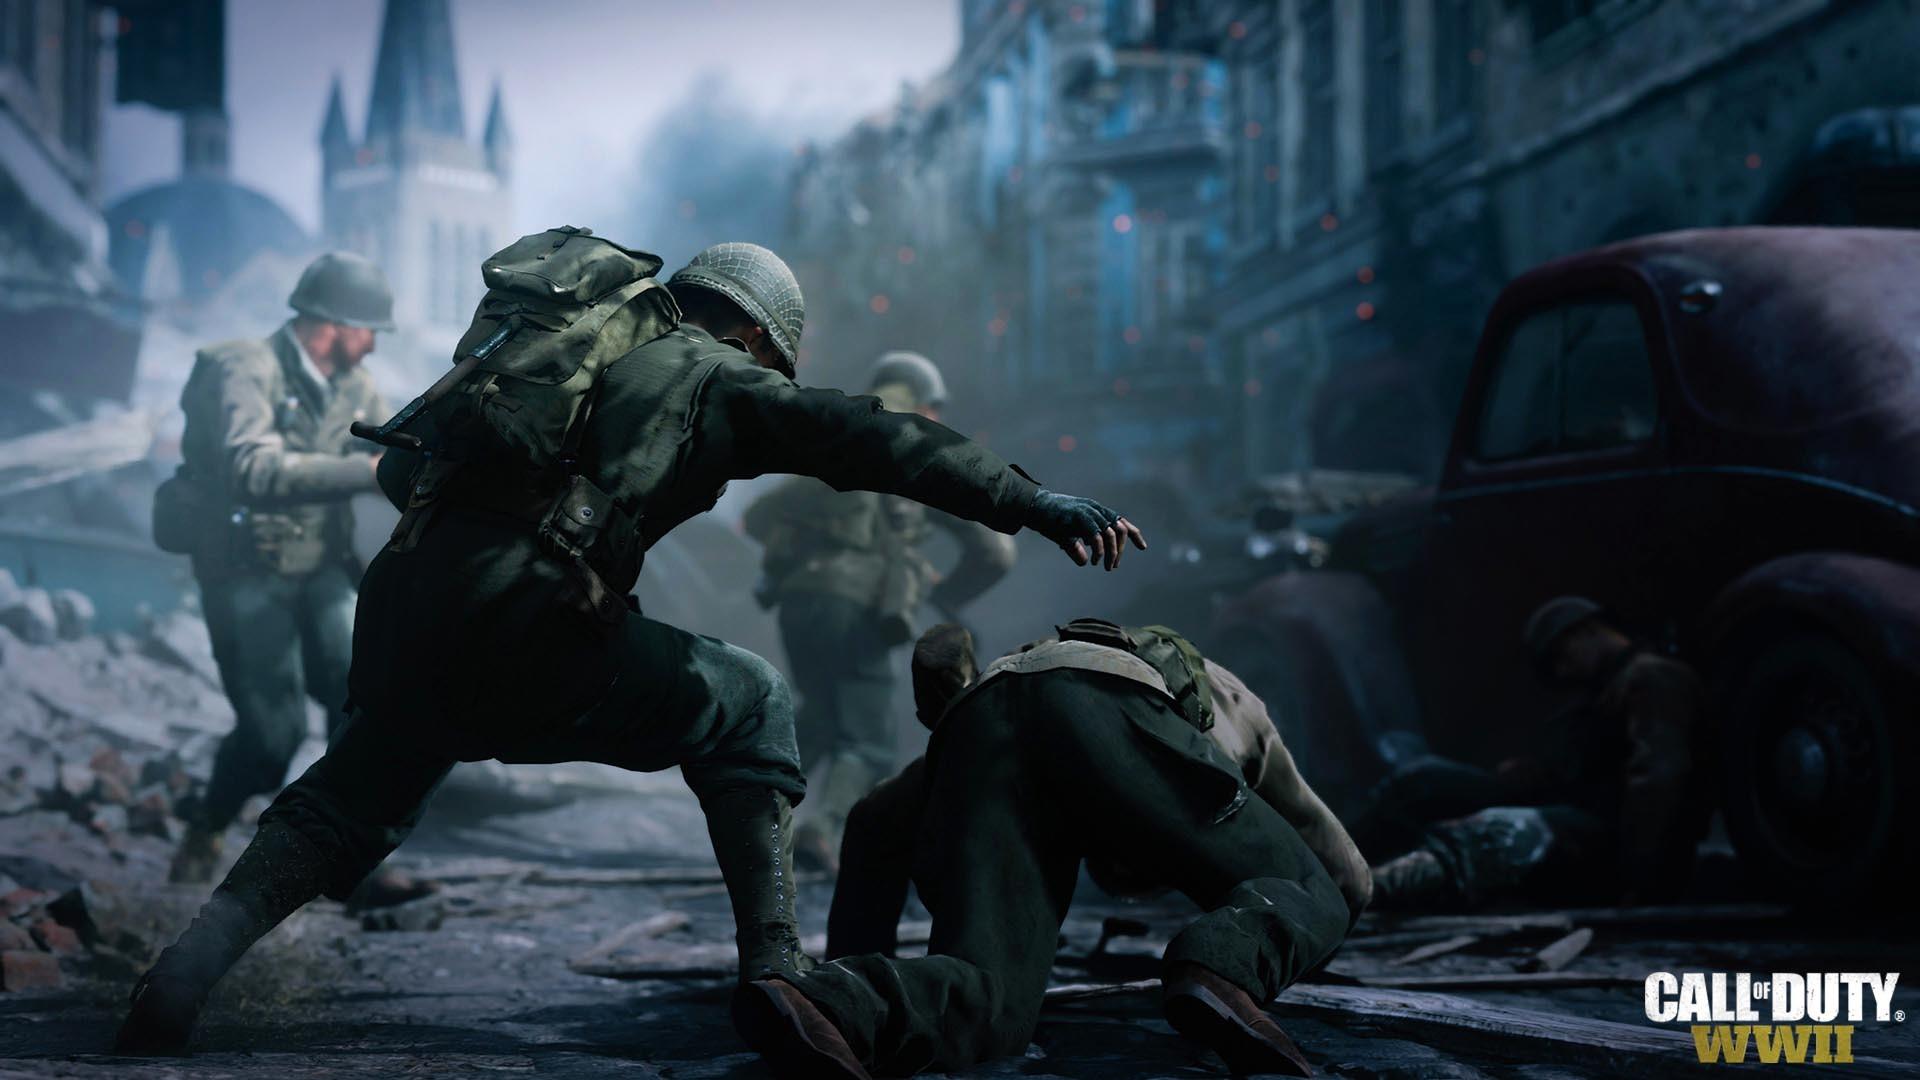 Call of Duty: WWII wallpaper wallpaper